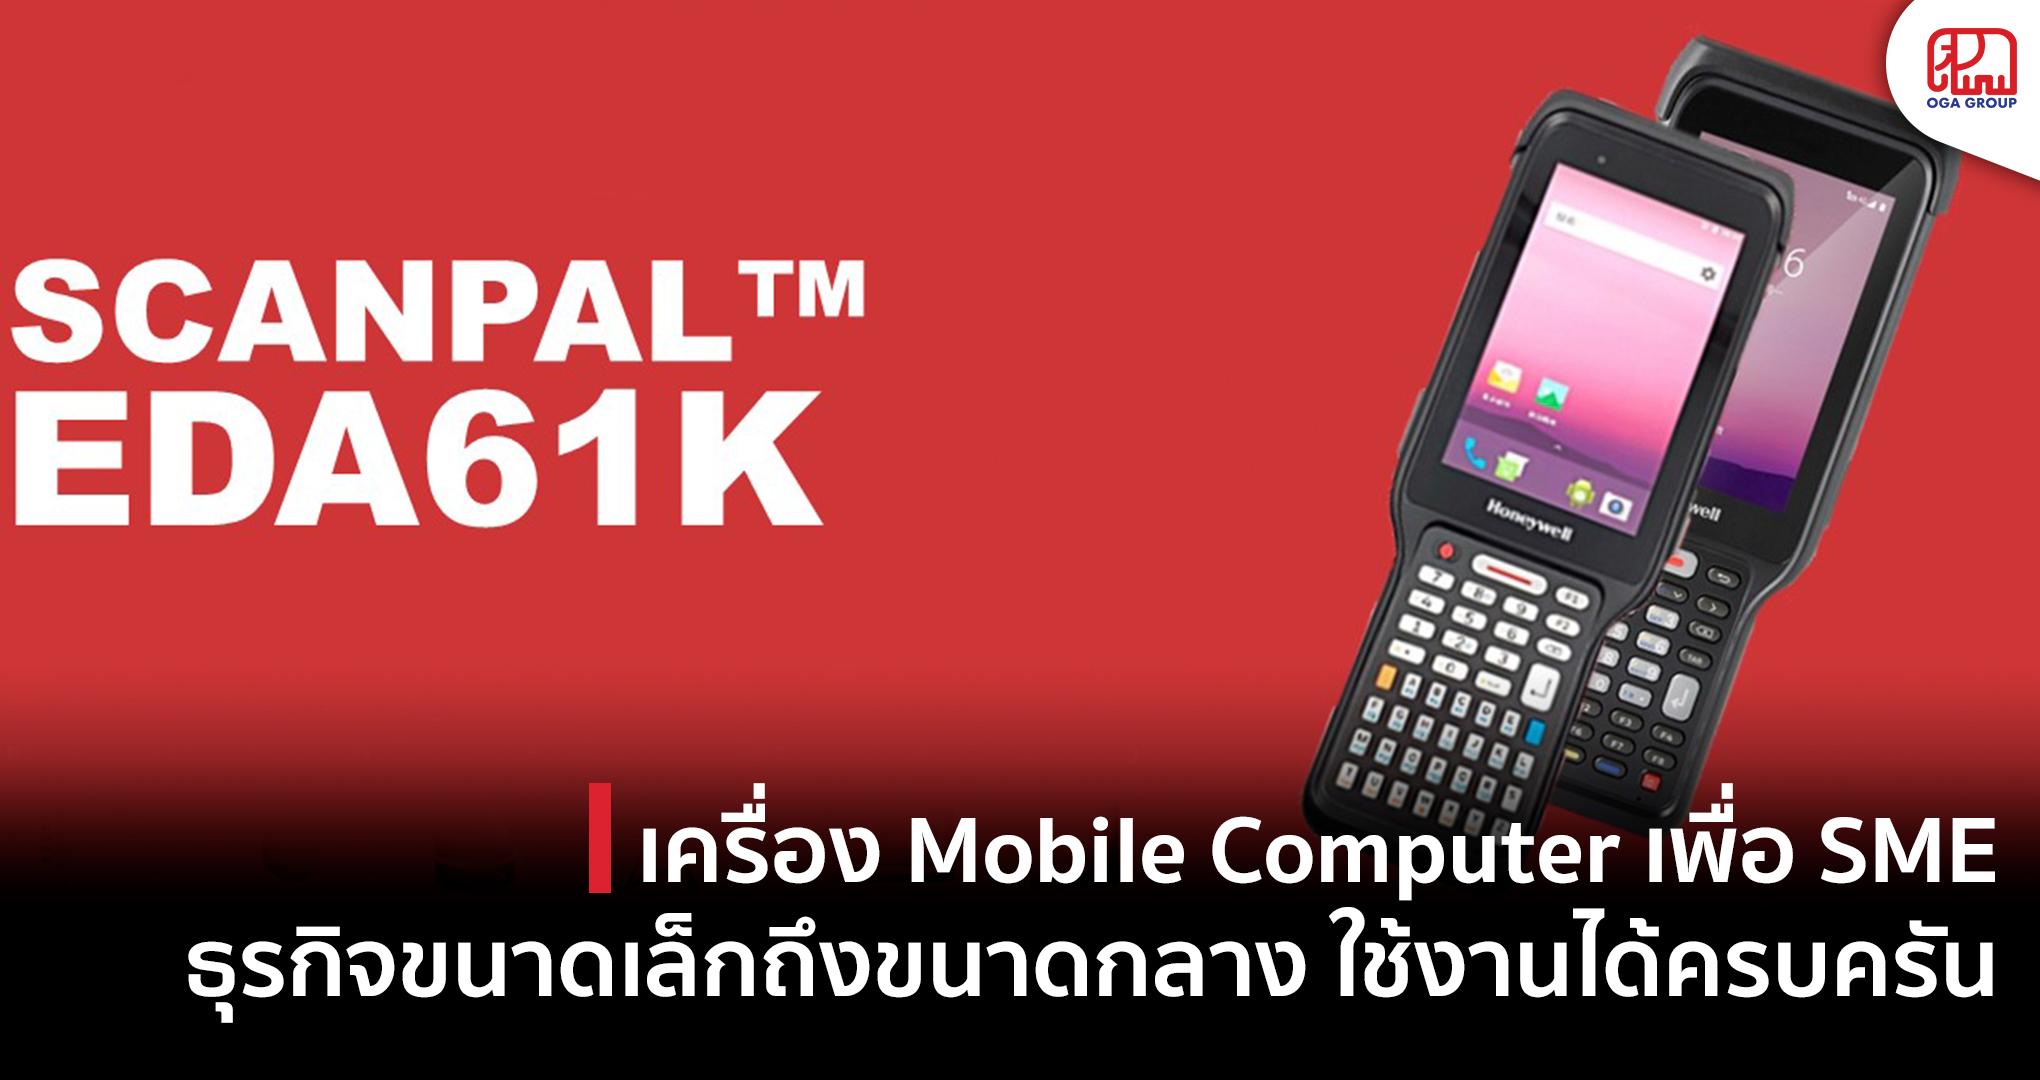 Honeywell ScanPal EDA61K เครื่อง Mobile Computer เพื่อ SME